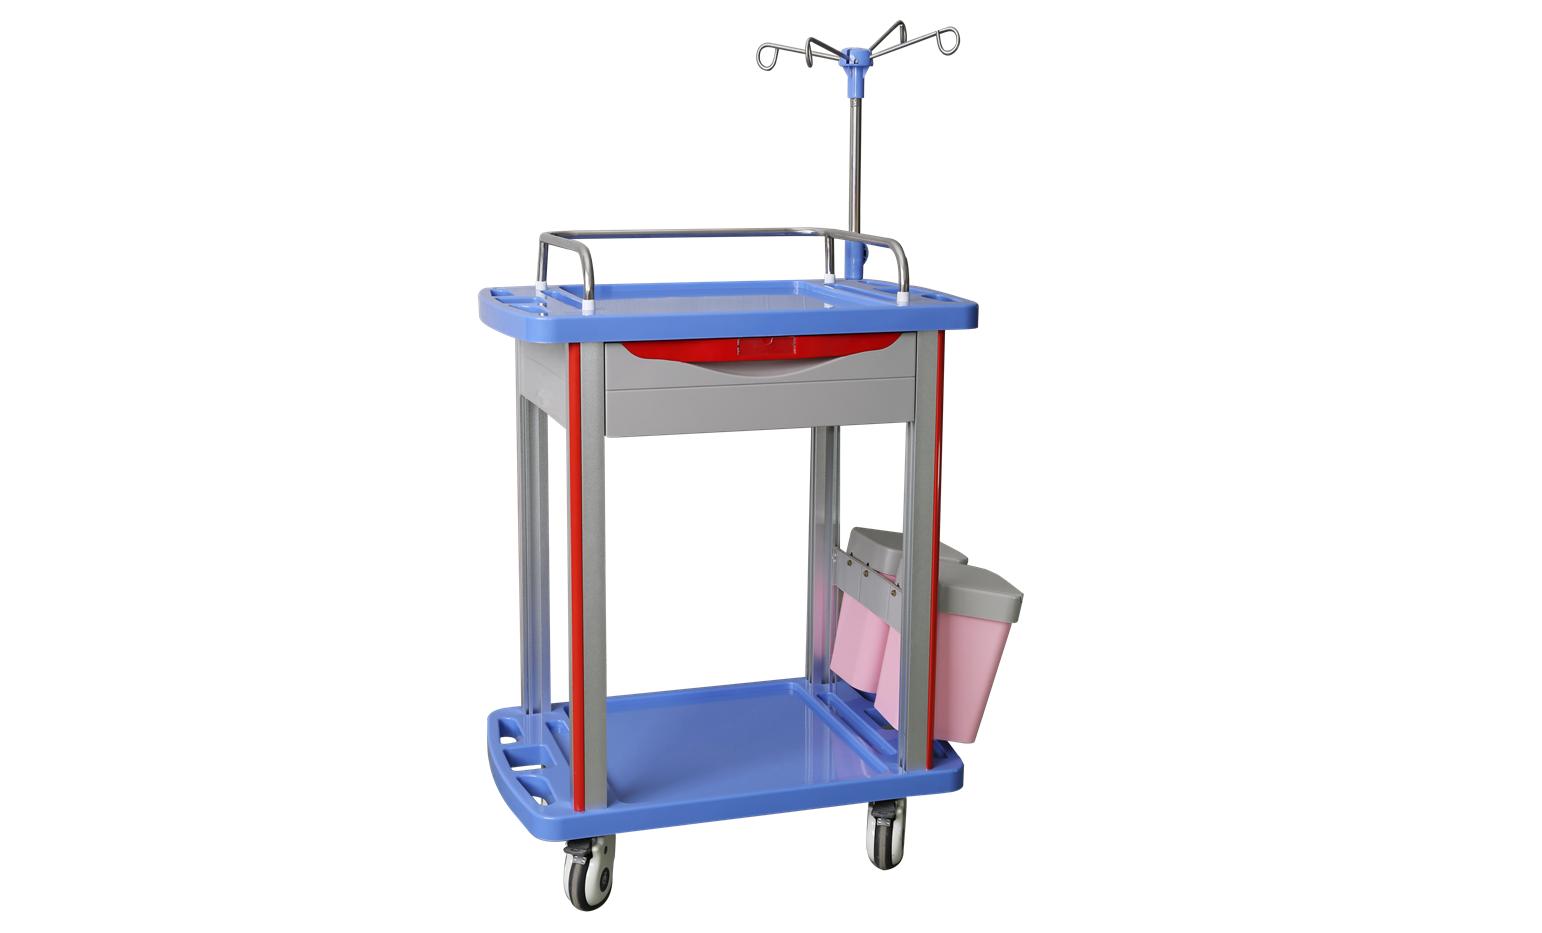 DW-TT006 ABS Treatment trolley